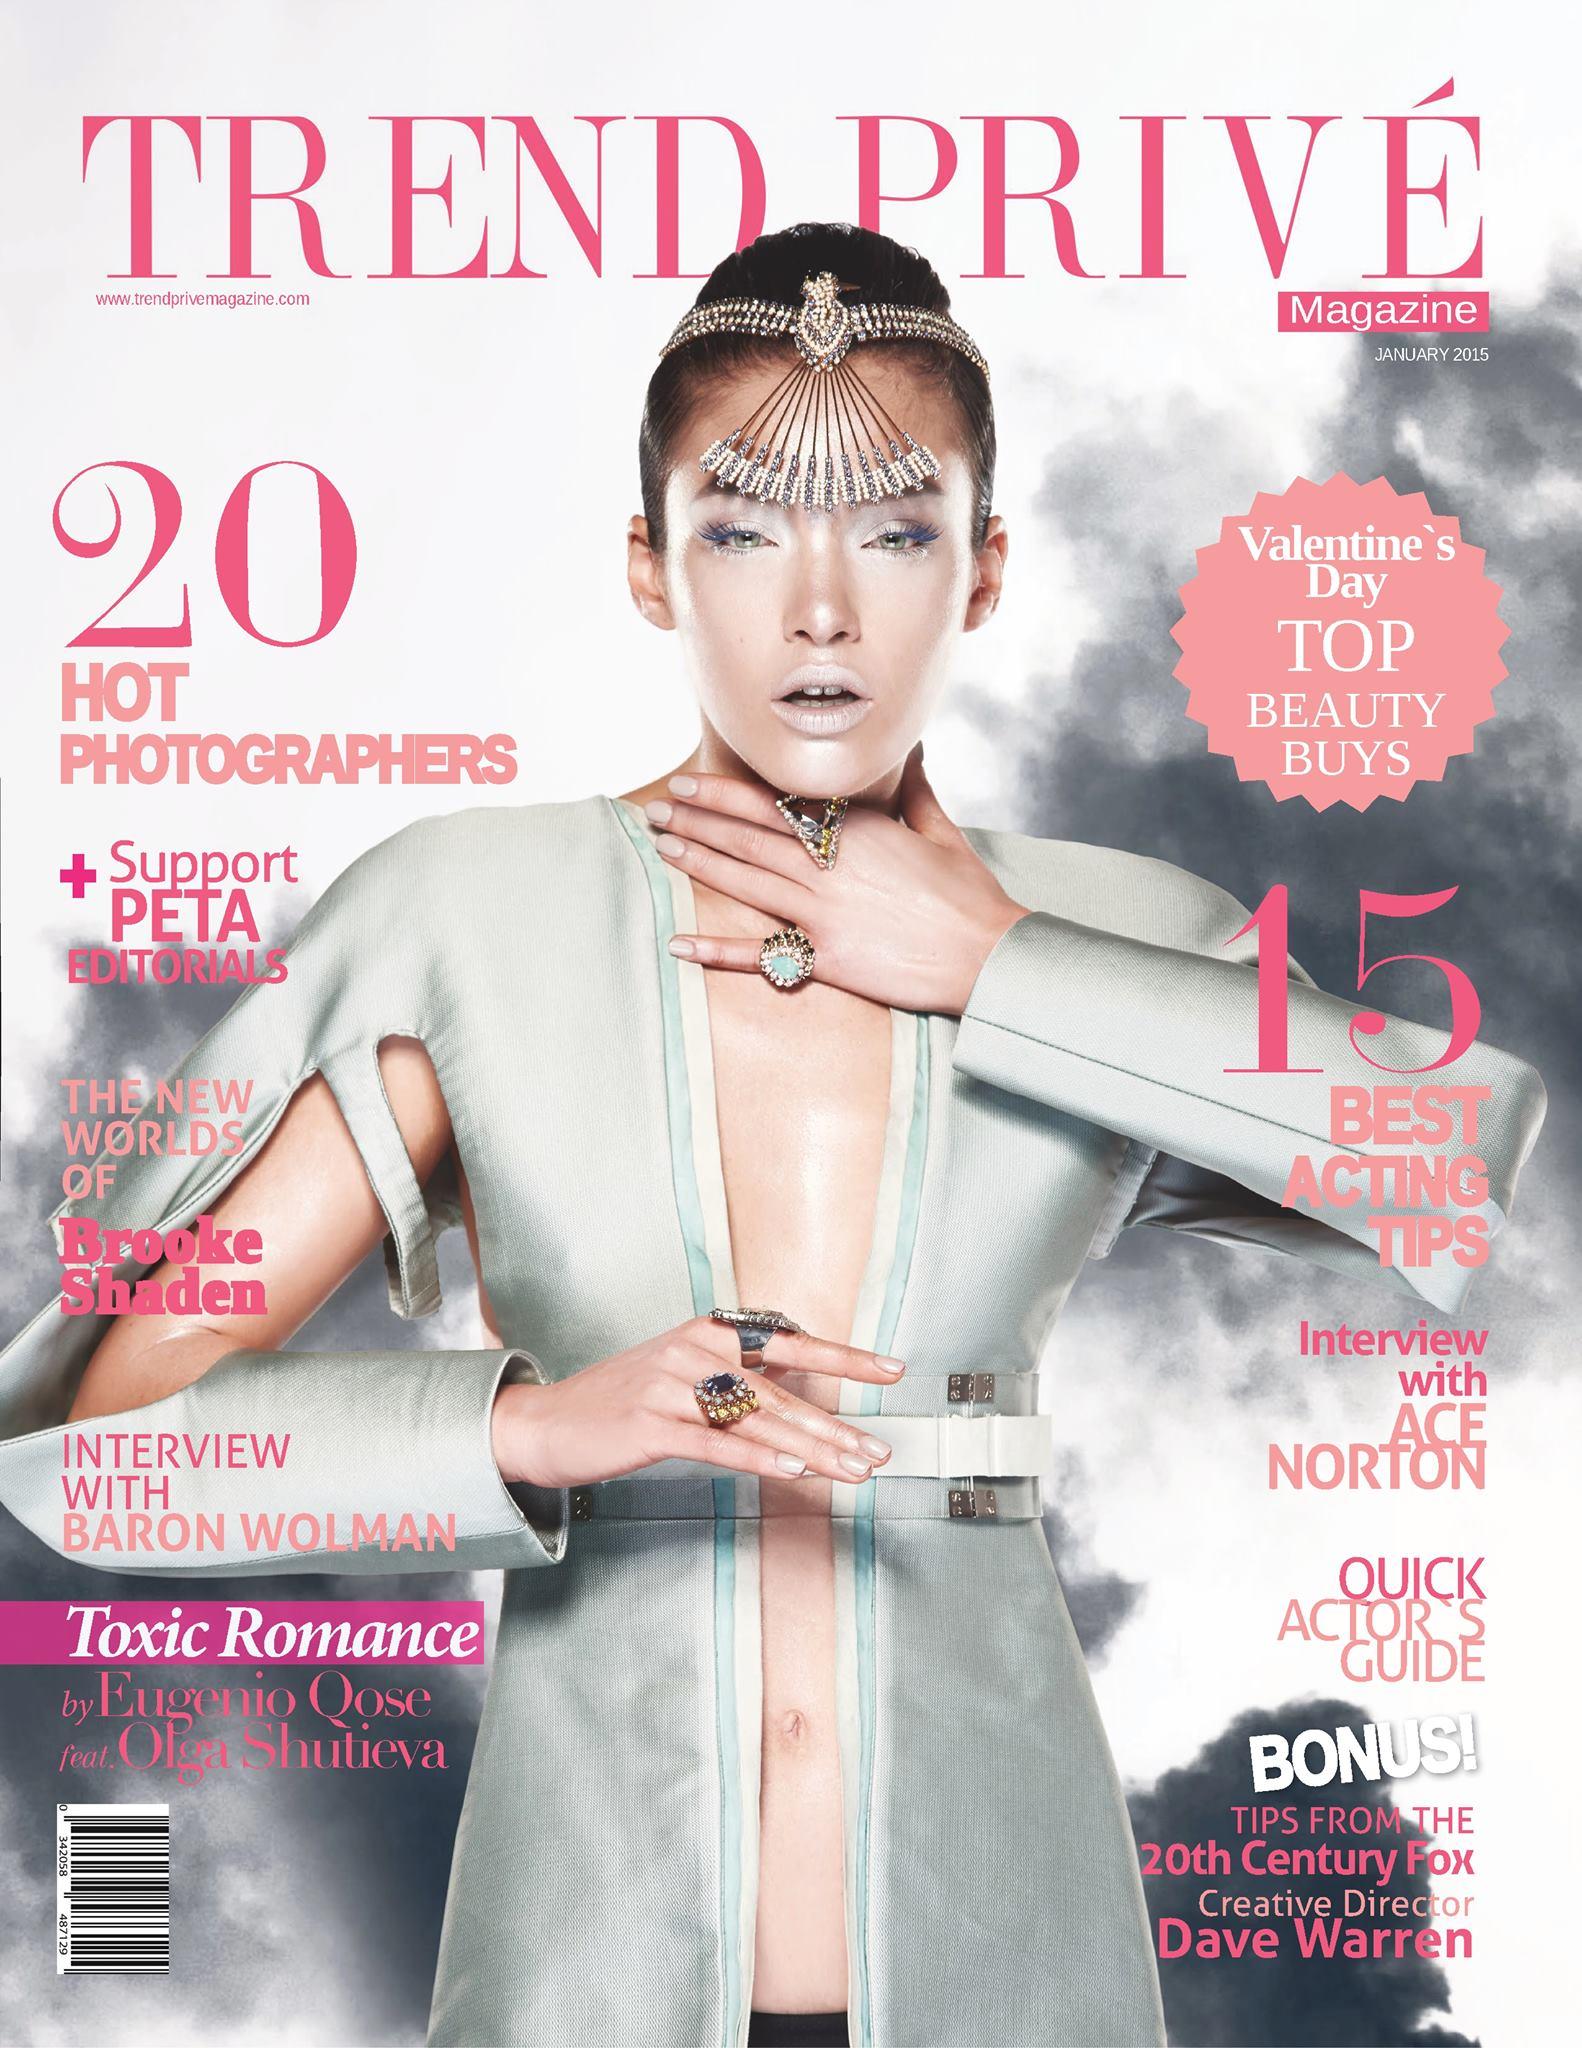 olga_shutieva_eugenio_qose_trend_prive_magazine